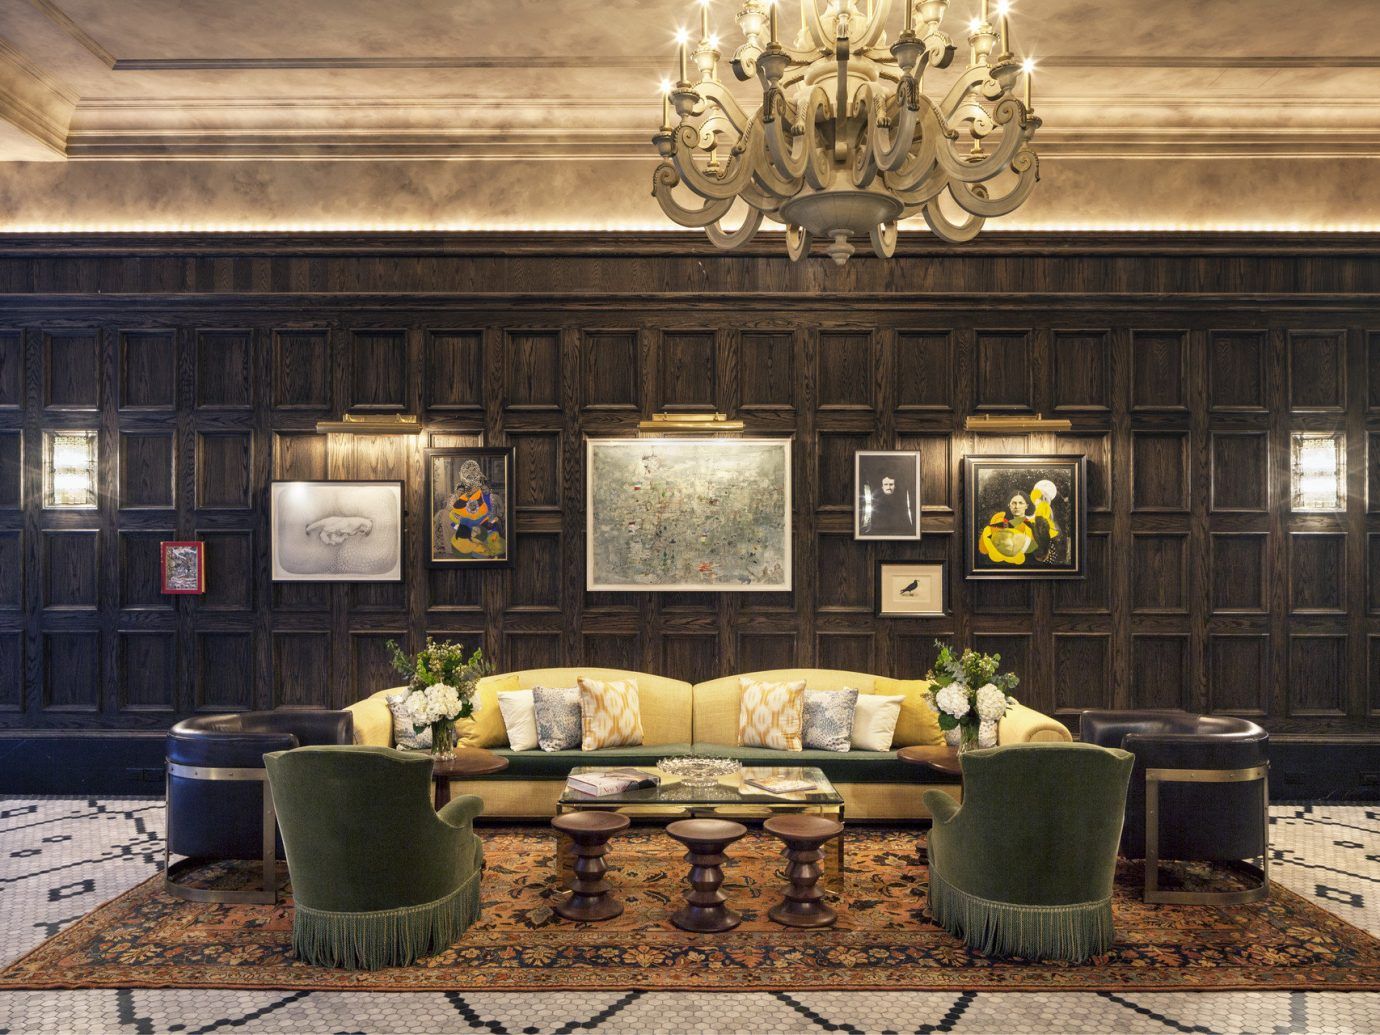 Hotels NYC room living room Lobby estate interior design home lighting mansion Design